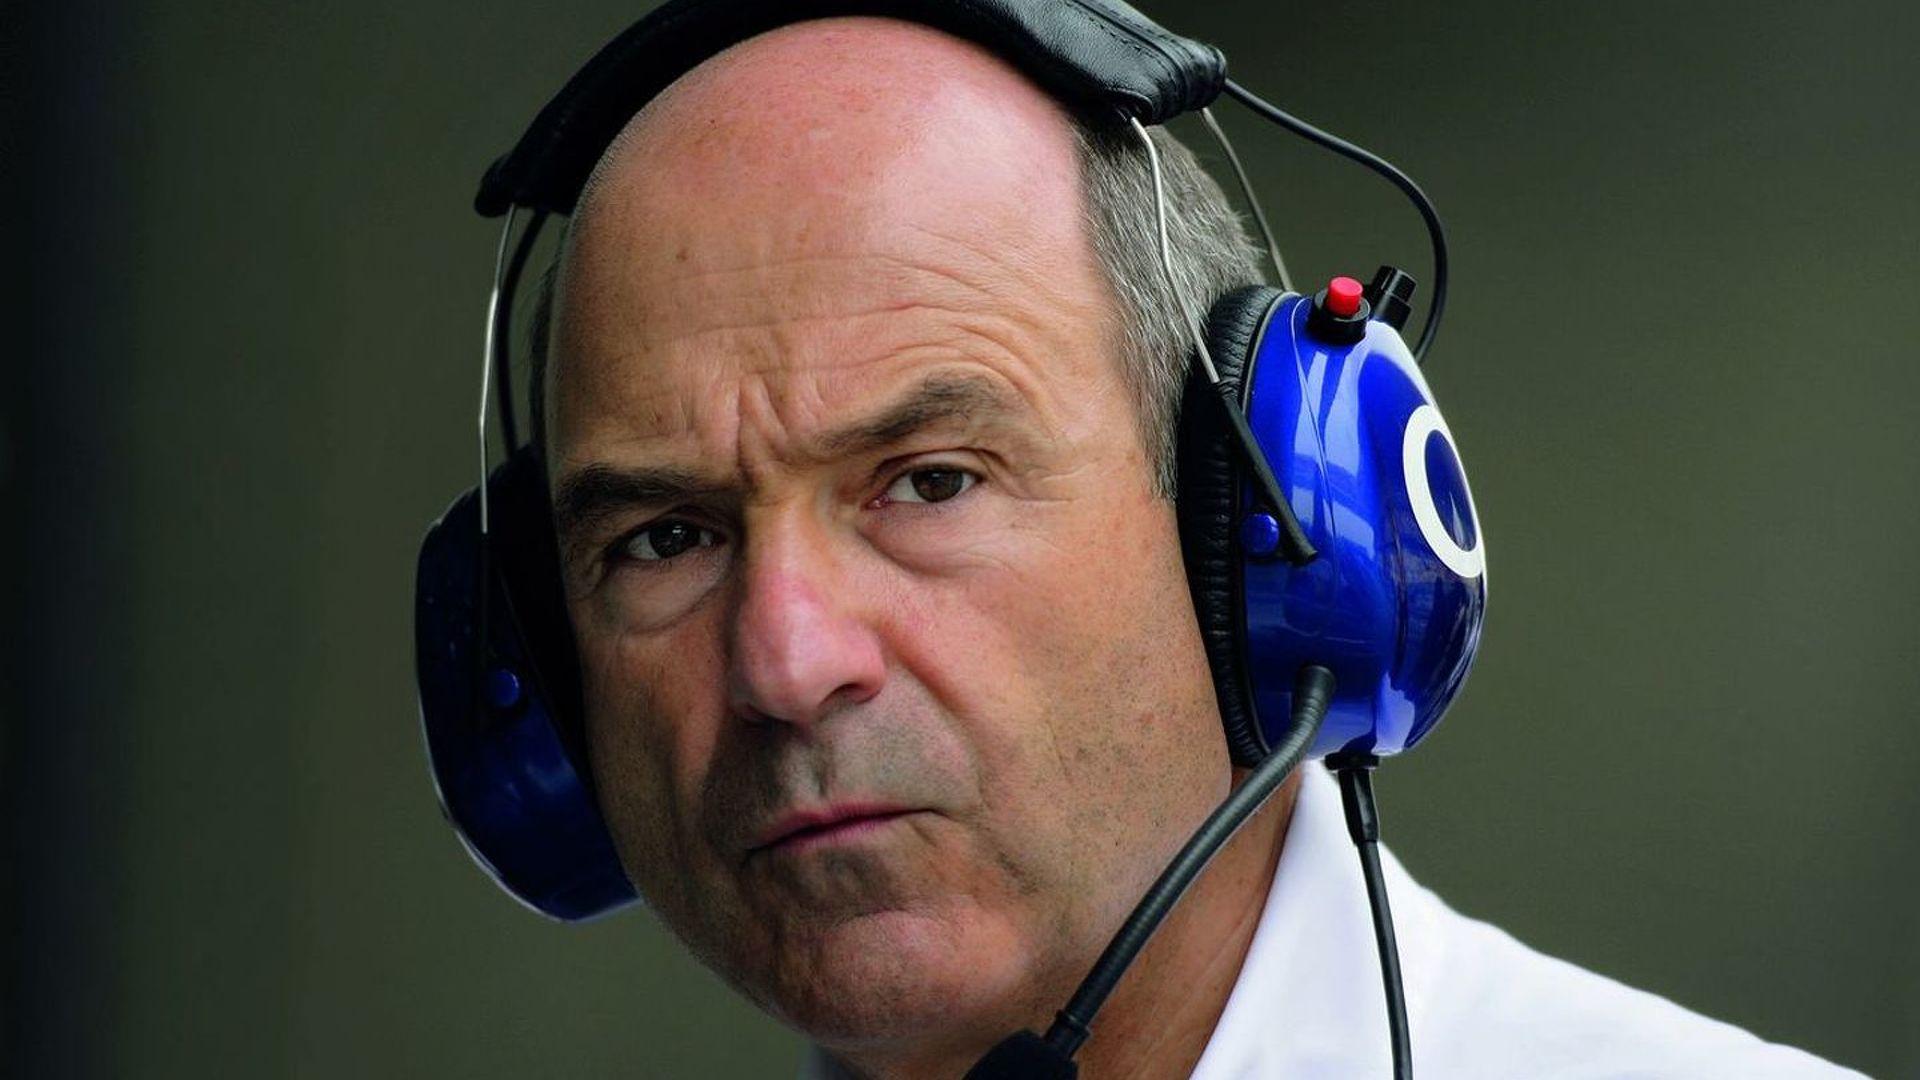 No joy yet as Sauber waits for FIA